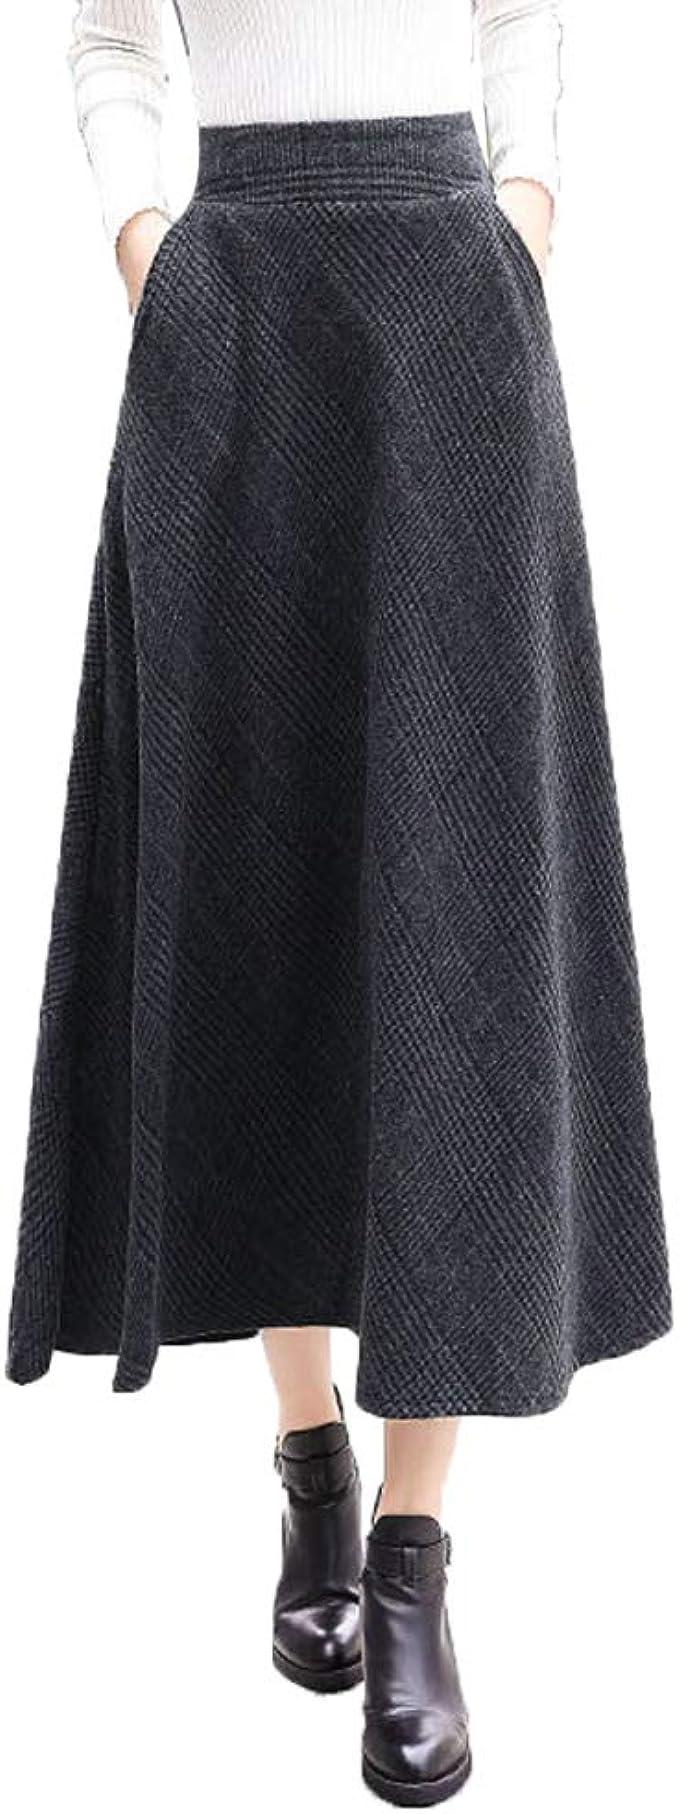 NIAIS Mujeres Ladys Vintage Lattice Woolen Falda Larga Elegante ...